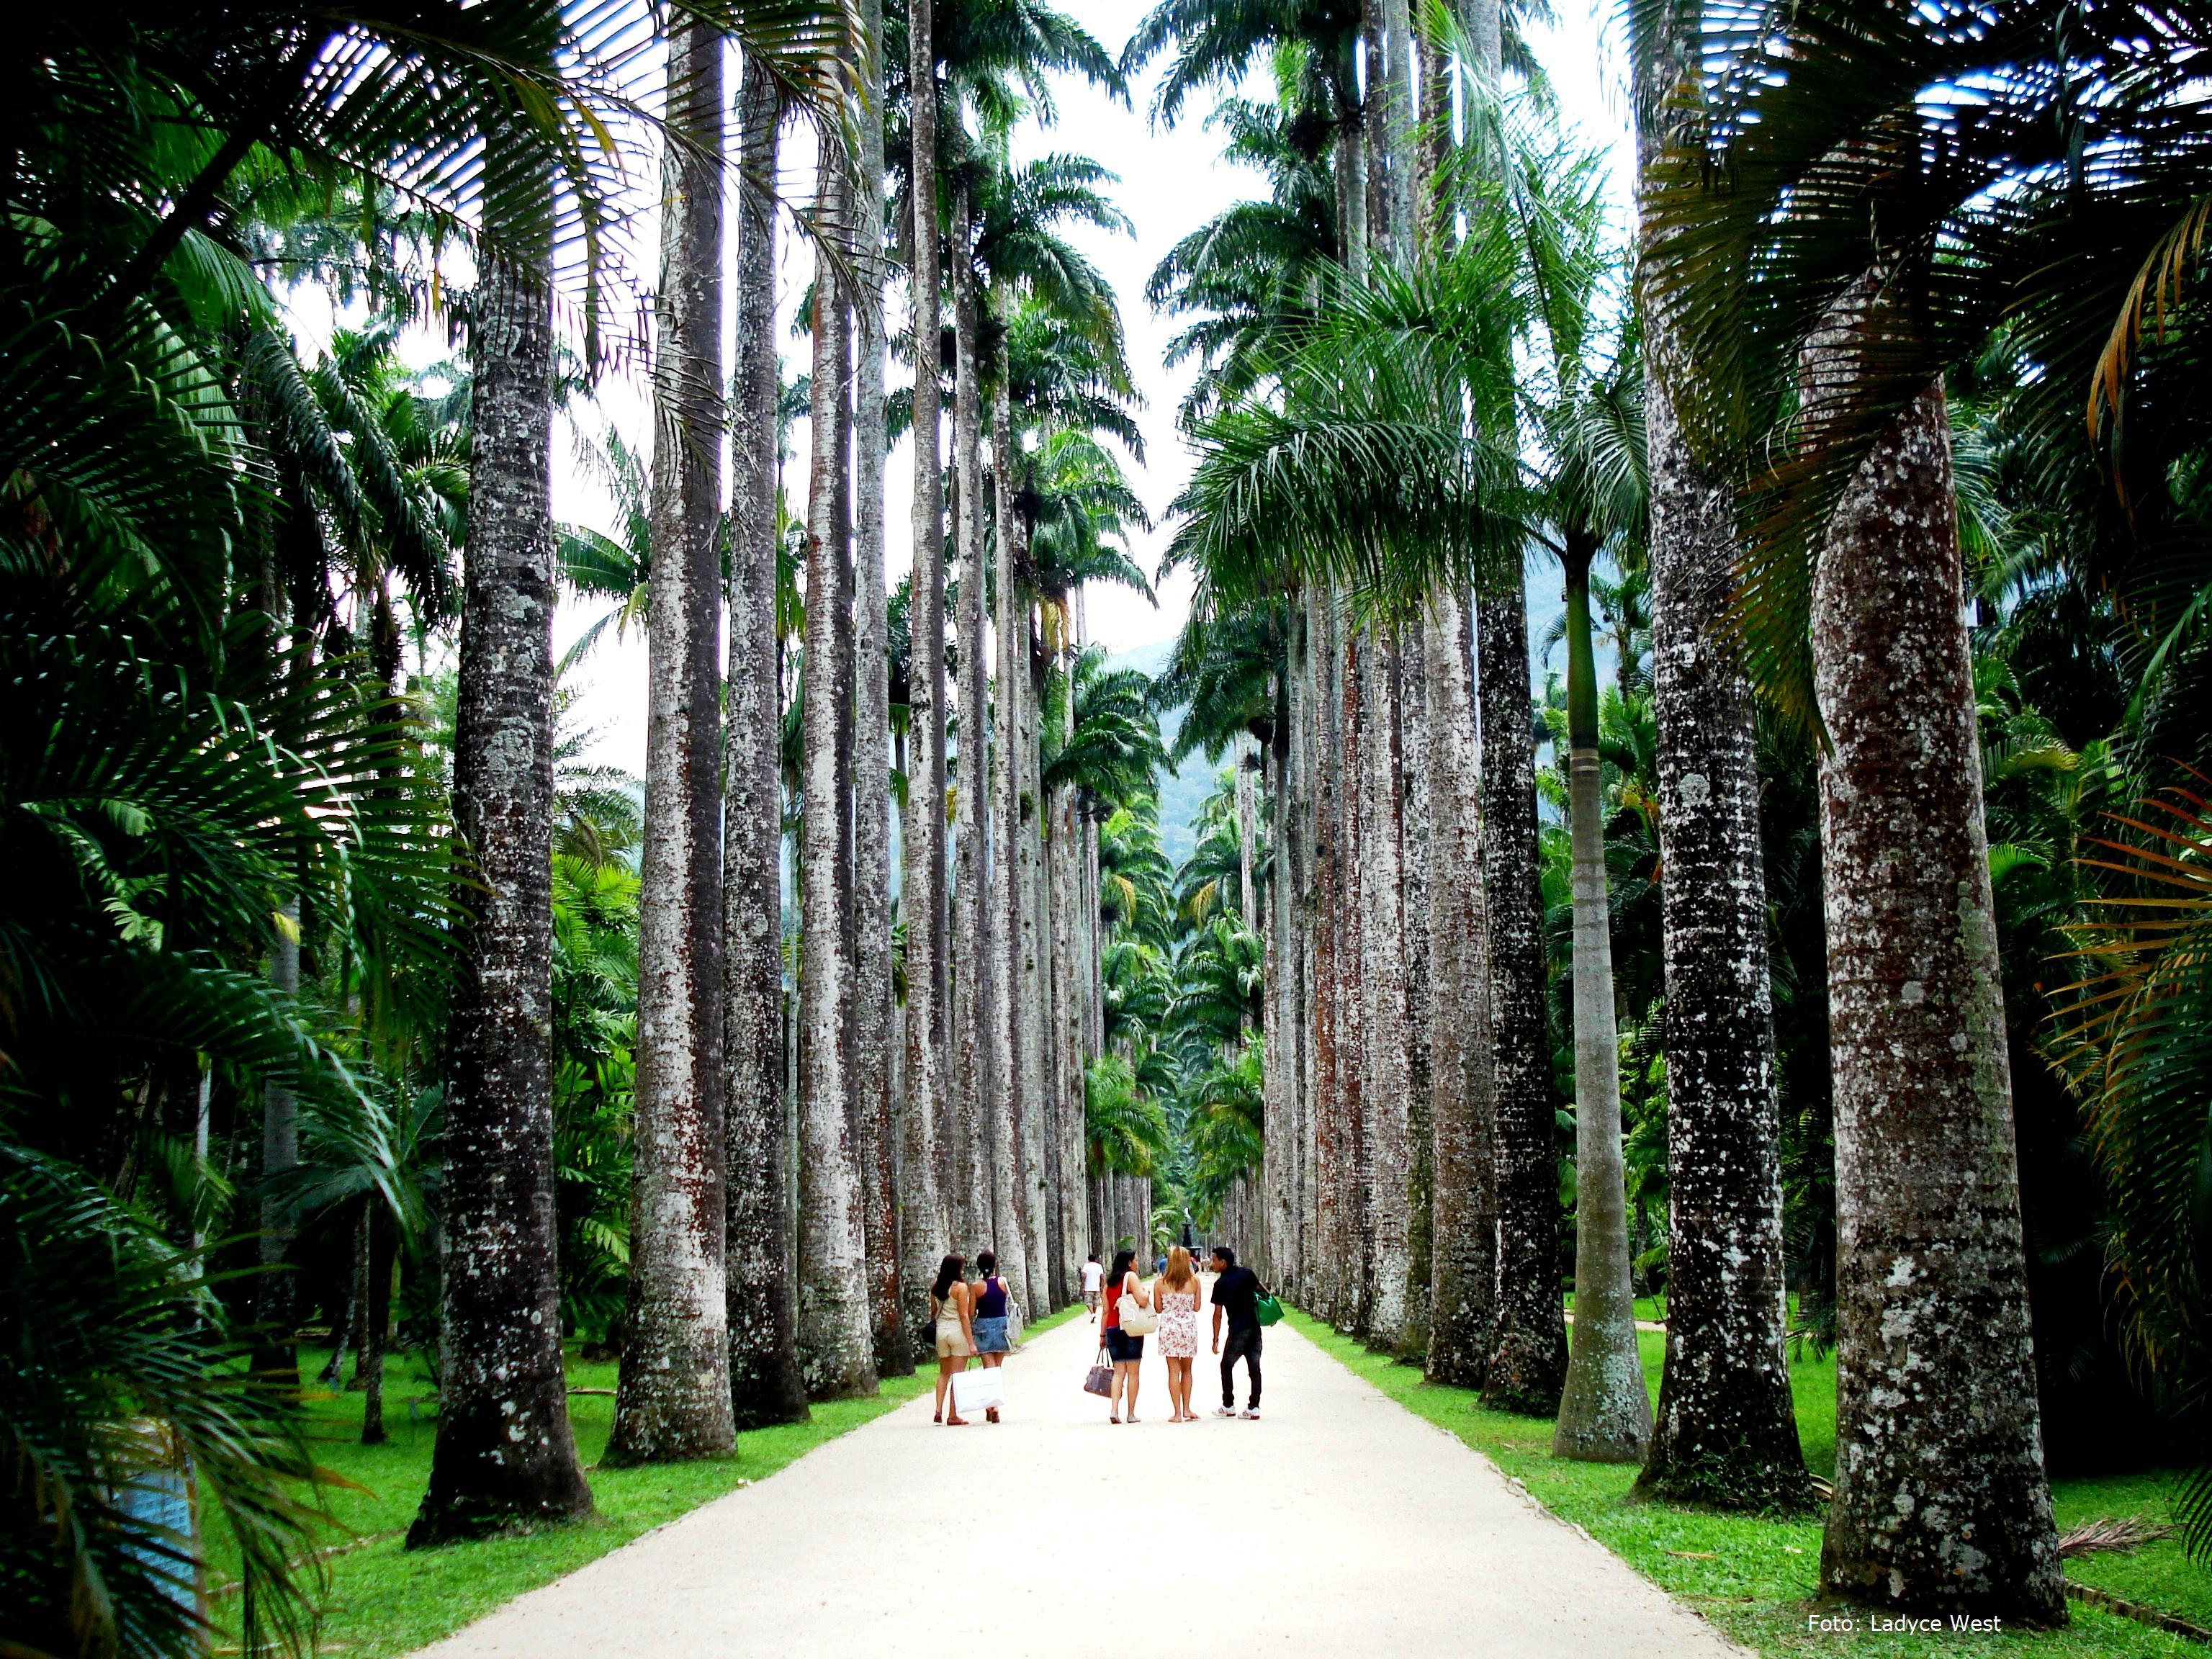 fotos jardim botanico do rio de janeiro:Jardim Botanico Rio De Janeiro Brazil